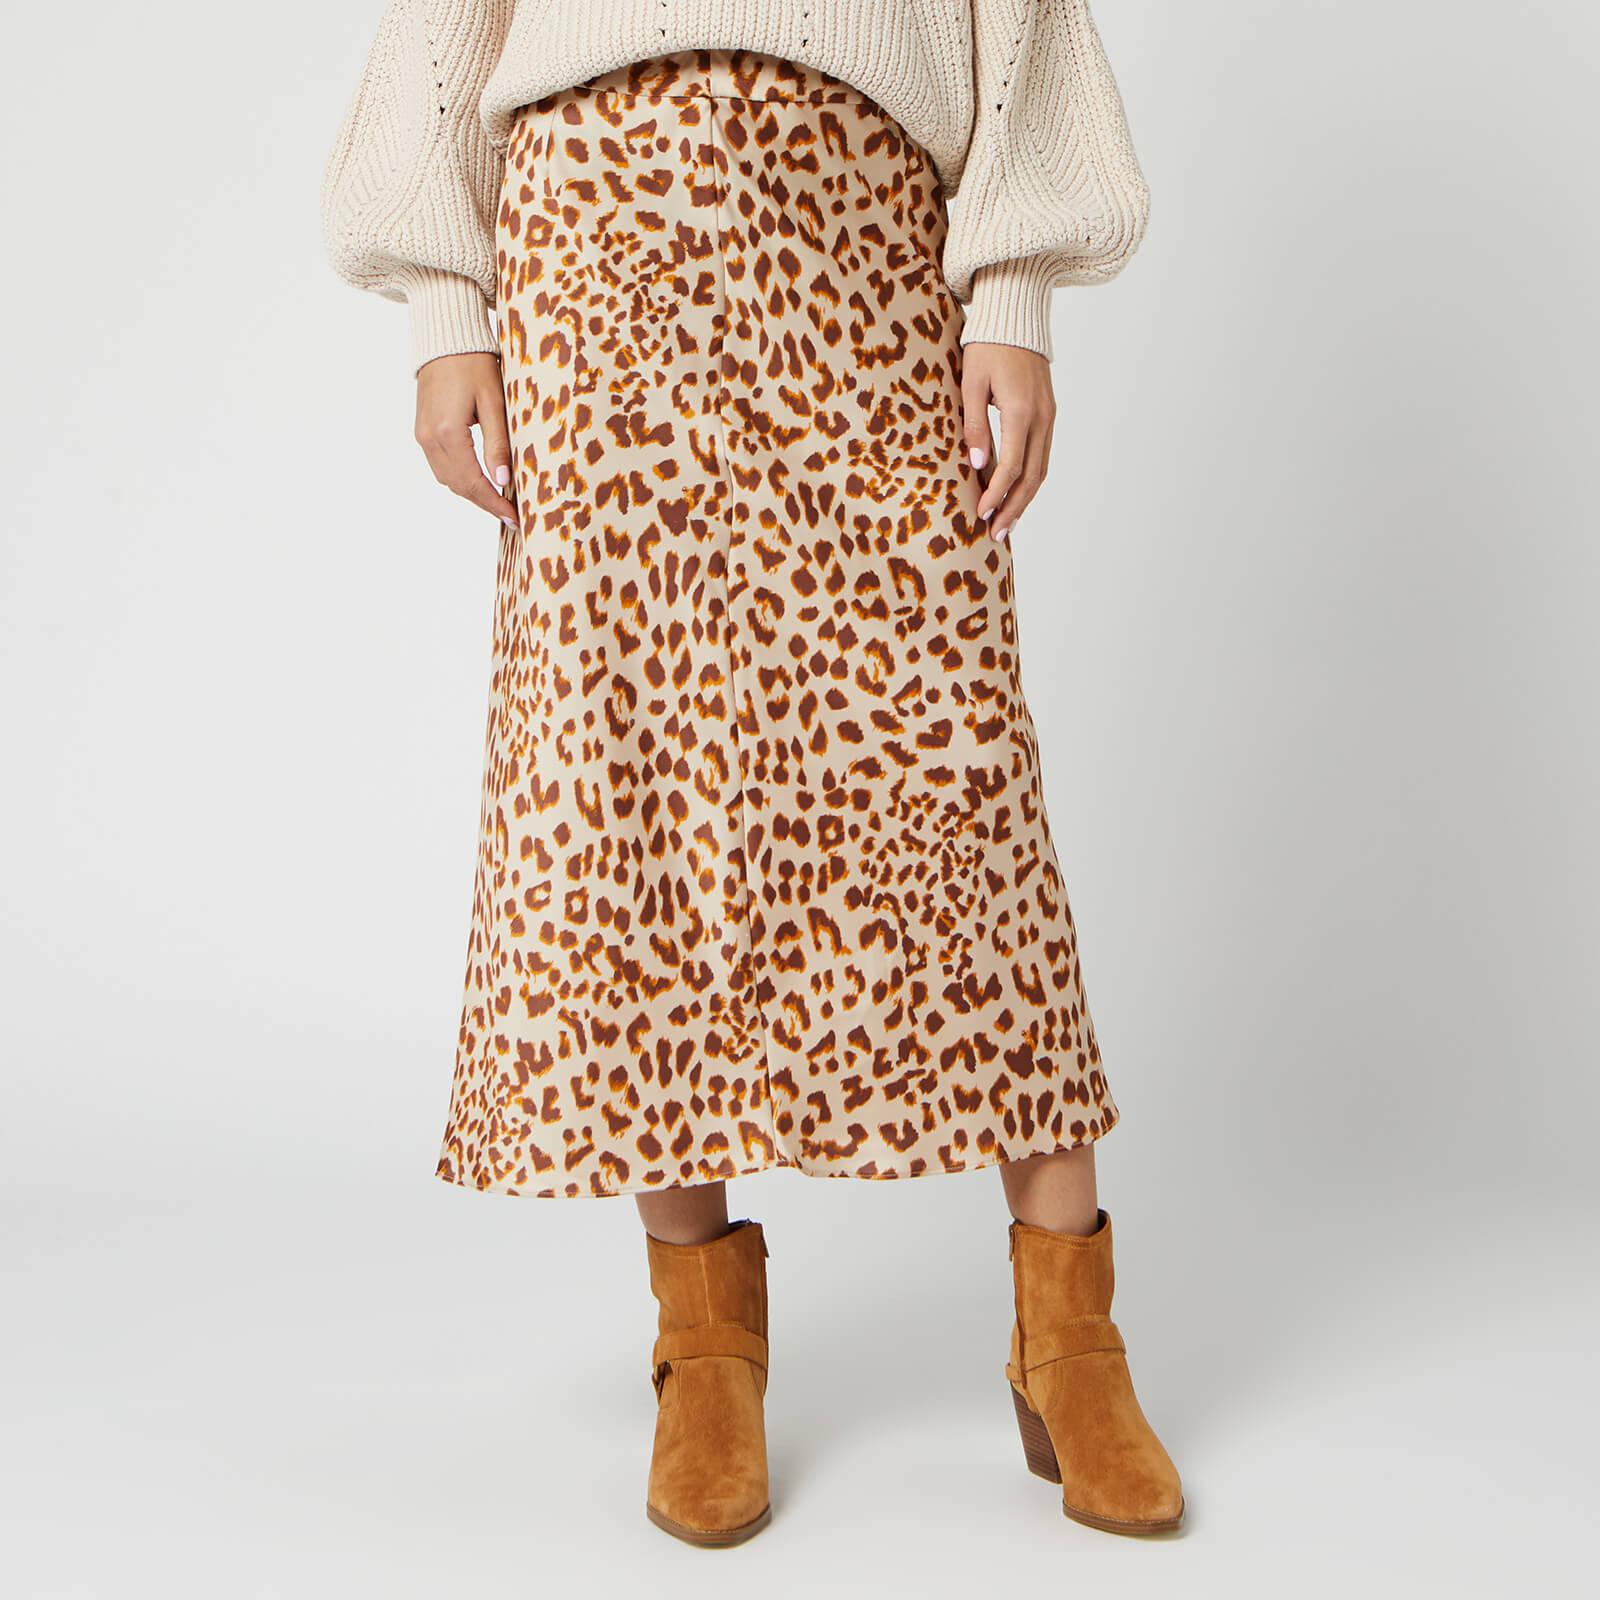 Free People Women's Normani Bias Skirt - Brown Leopard - US 2/UK 6